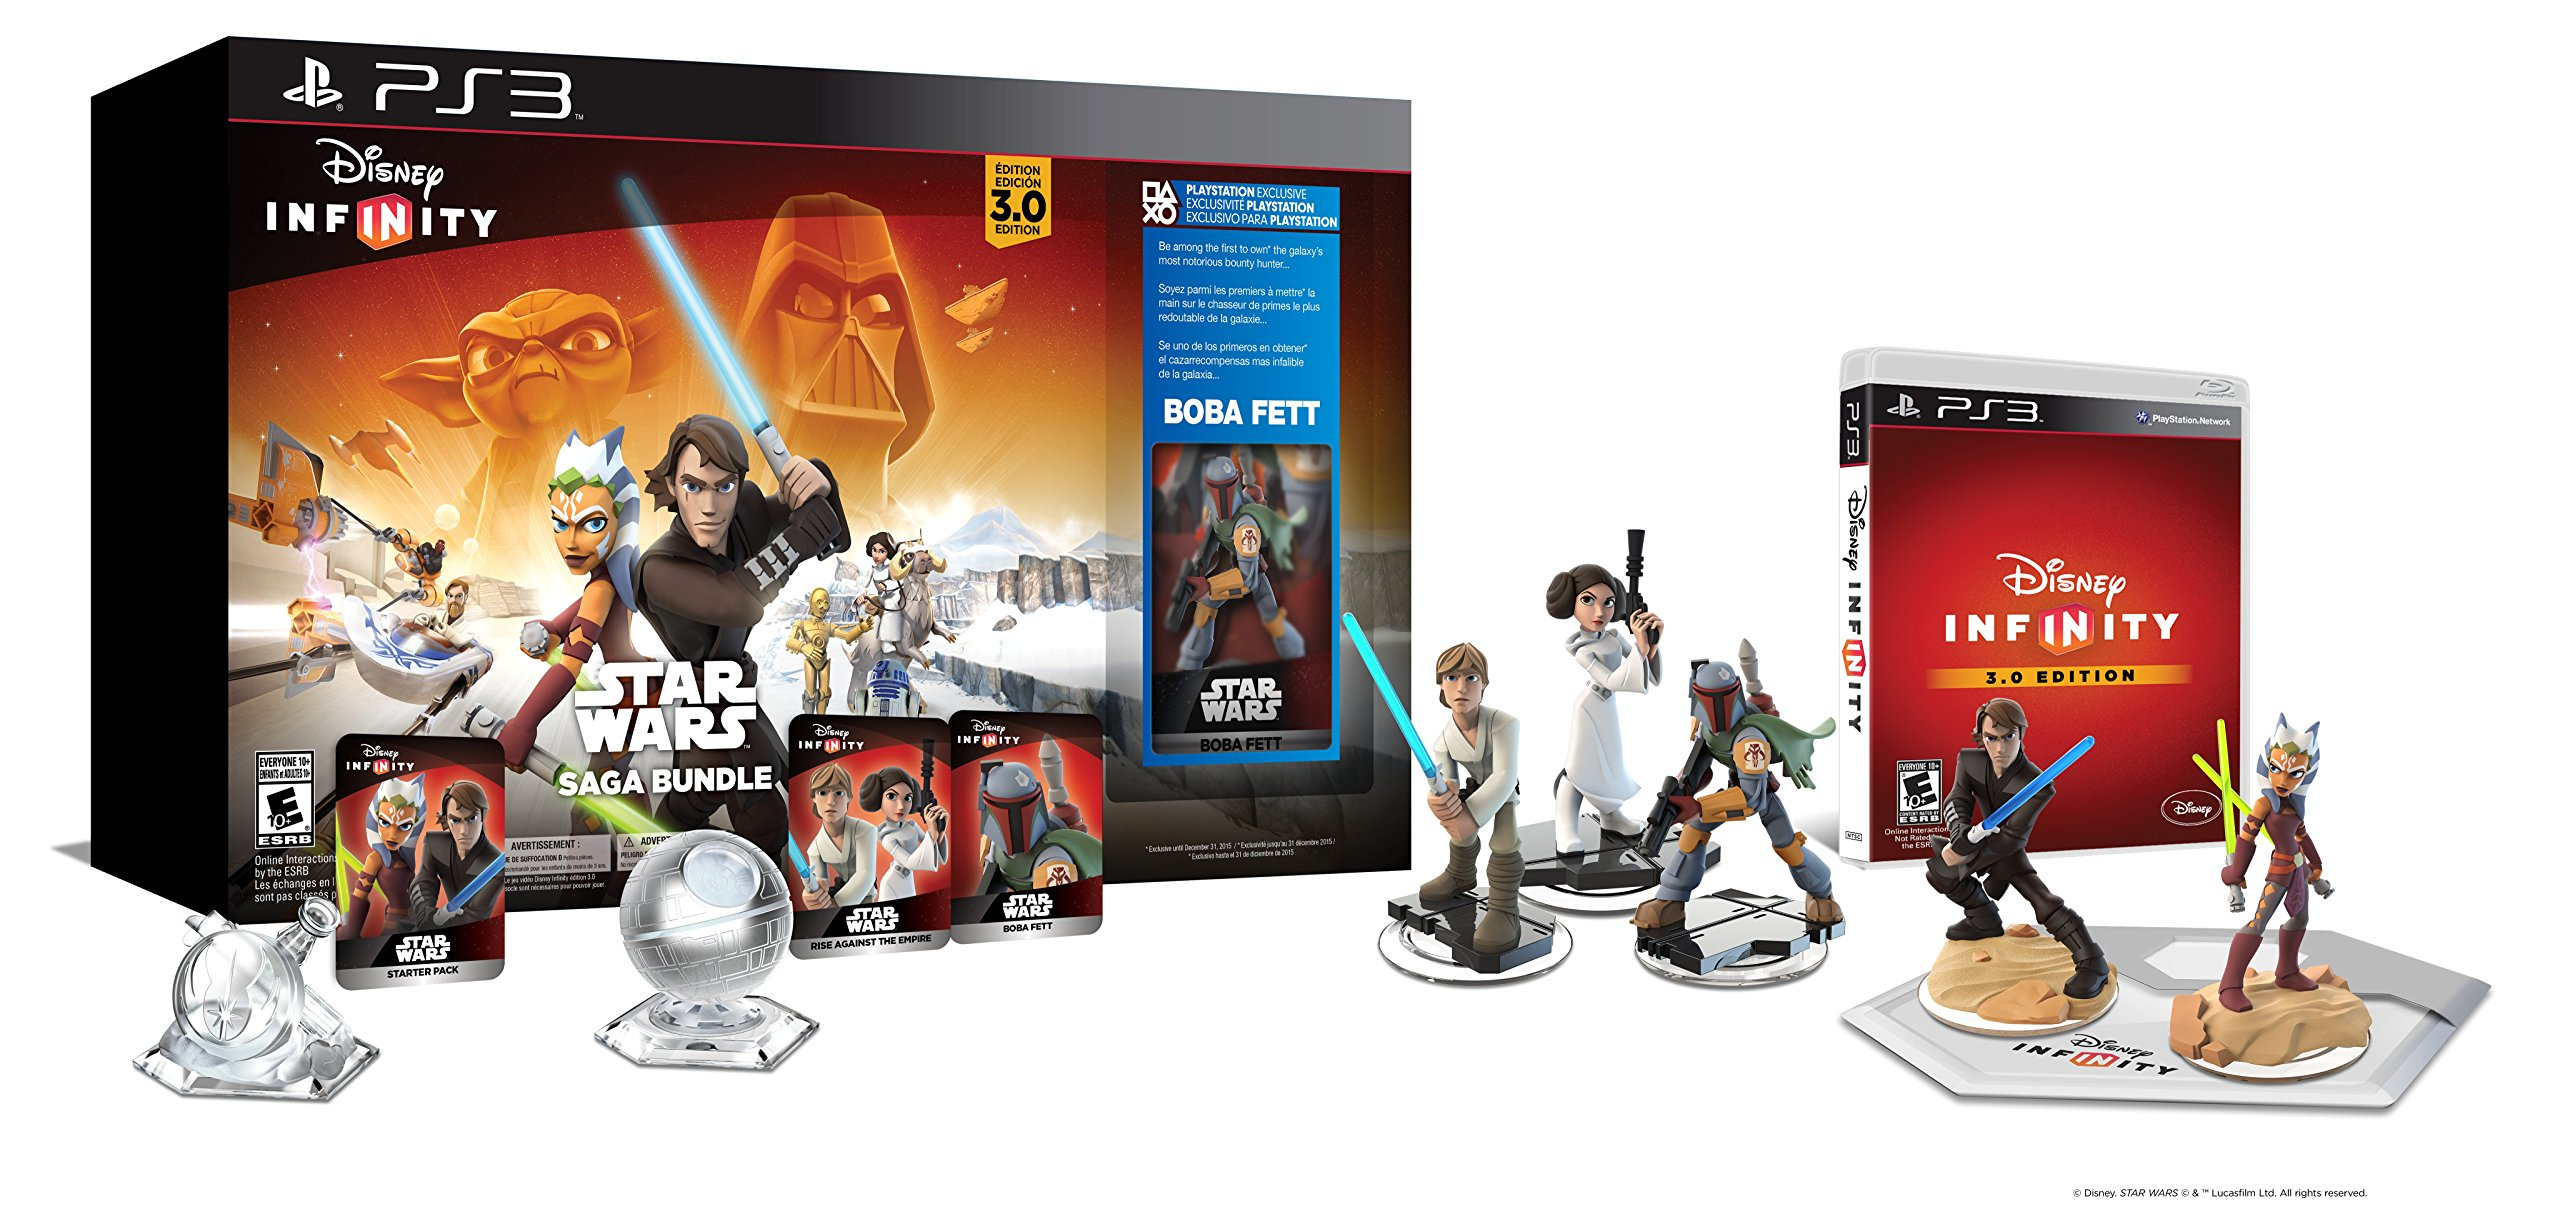 Disney Infinity 3.0 Edition: Star Wars™ Saga Bundle - PS3